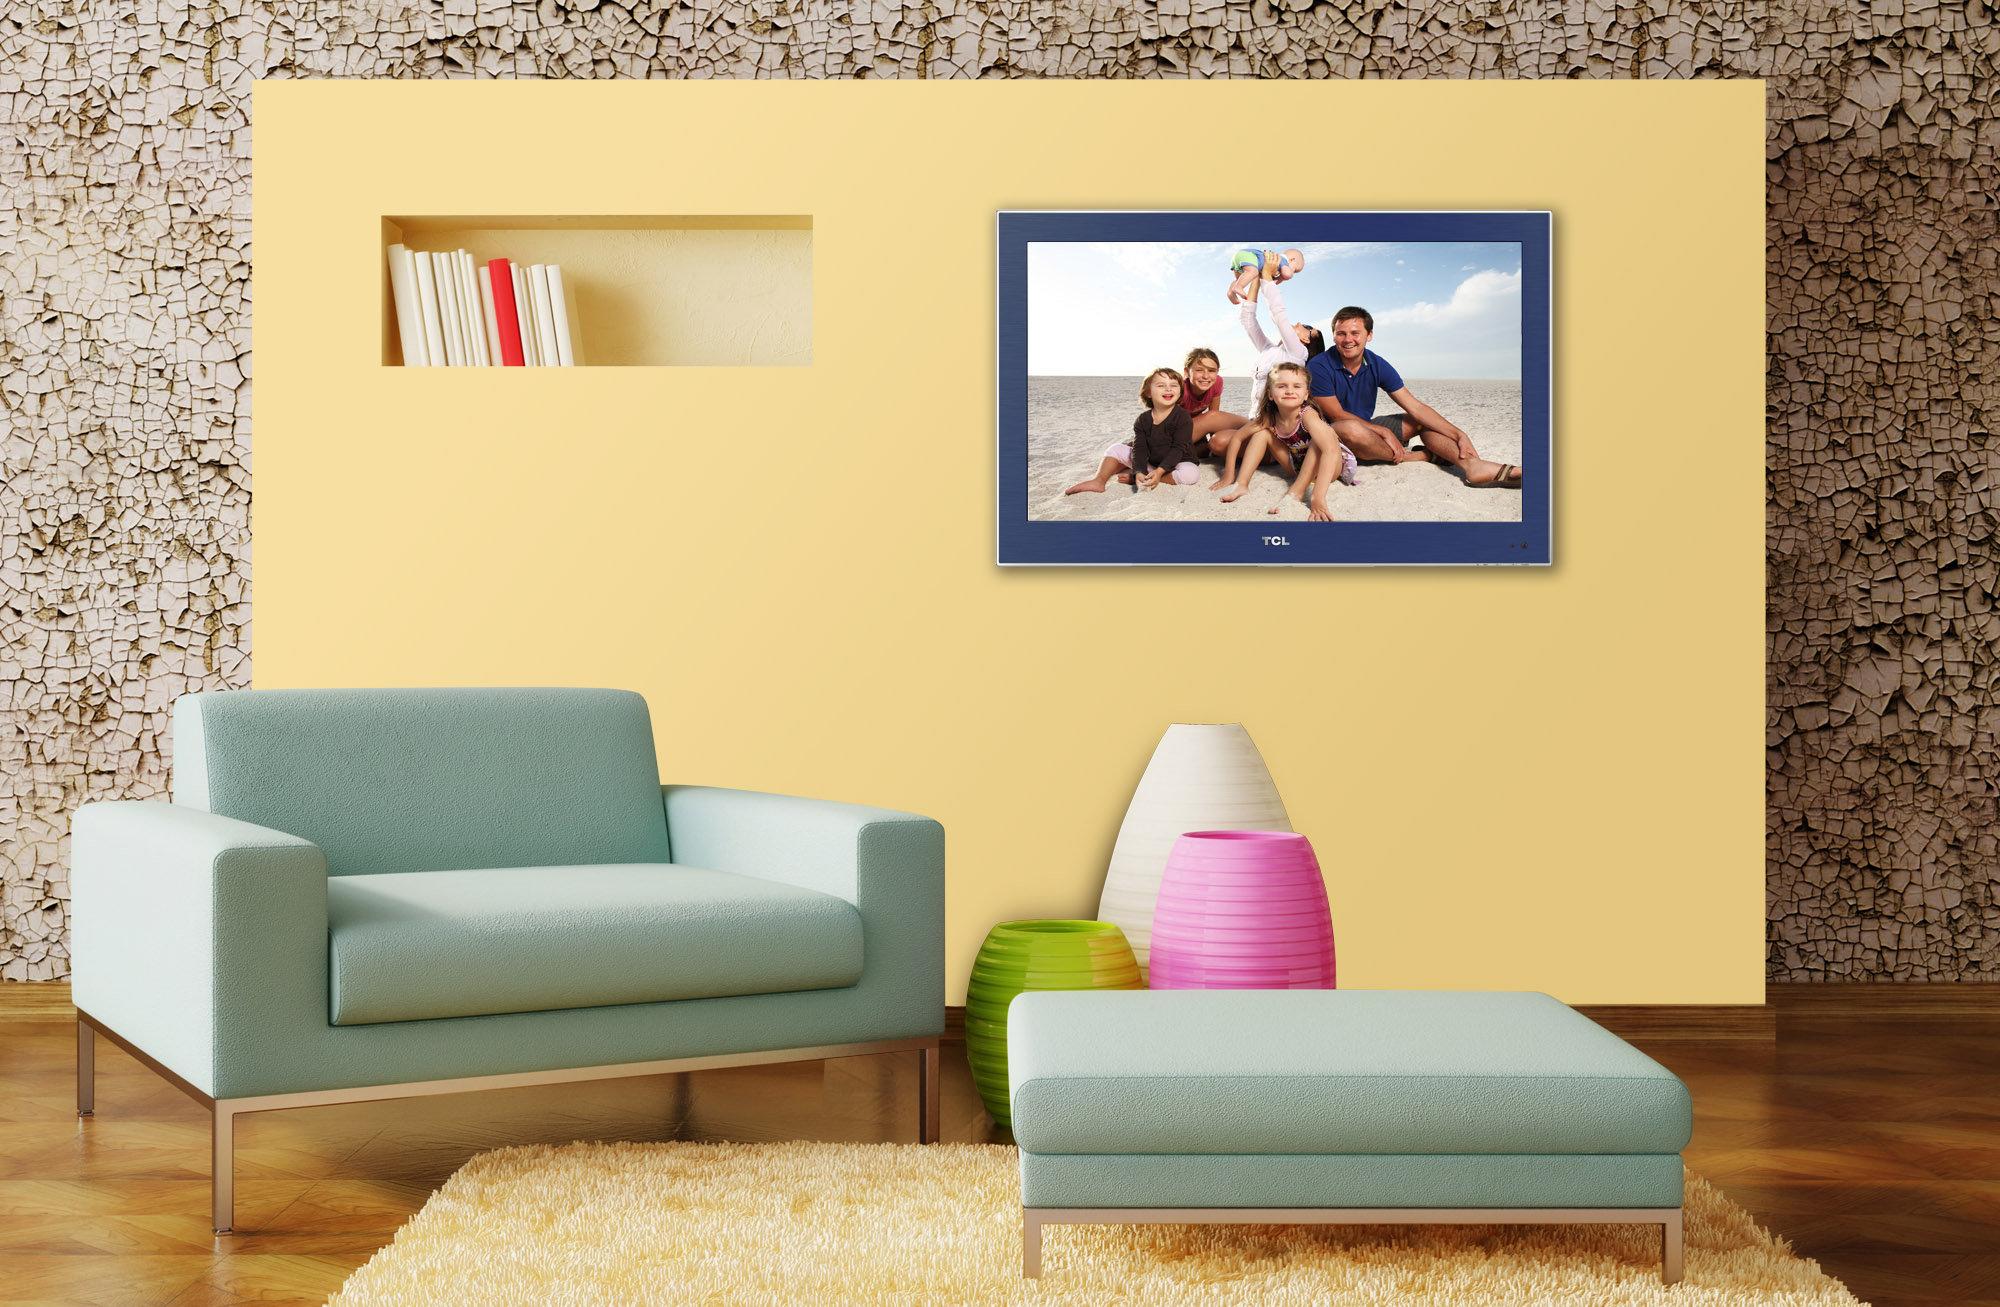 tcl l26e3130c 66 cm 26 zoll fernseher hd ready twin tuner heimkino tv video. Black Bedroom Furniture Sets. Home Design Ideas